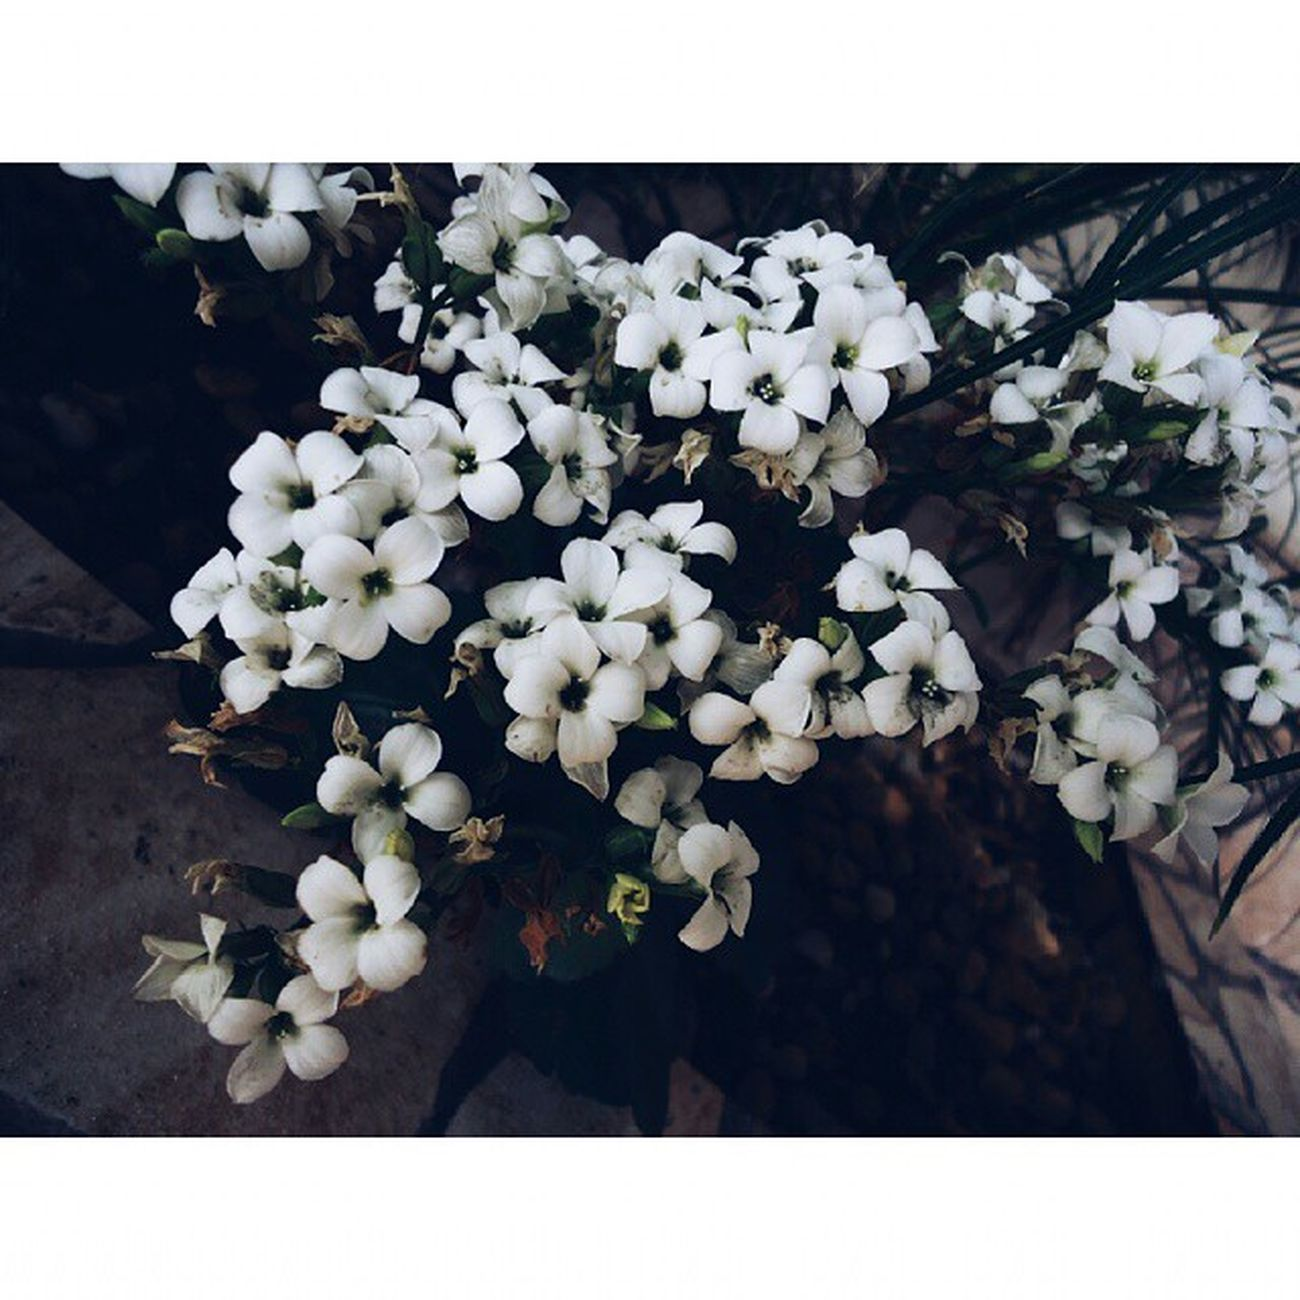 Bring me to life, wake me up ▪ Flowers ▪ Vscofeatures ▪ Vscovibe ▪ Vscobrasil ▪ vscophile ▪ vscofocus ▪ nature ▪ vscoonly ▪ vscoaddict ▪